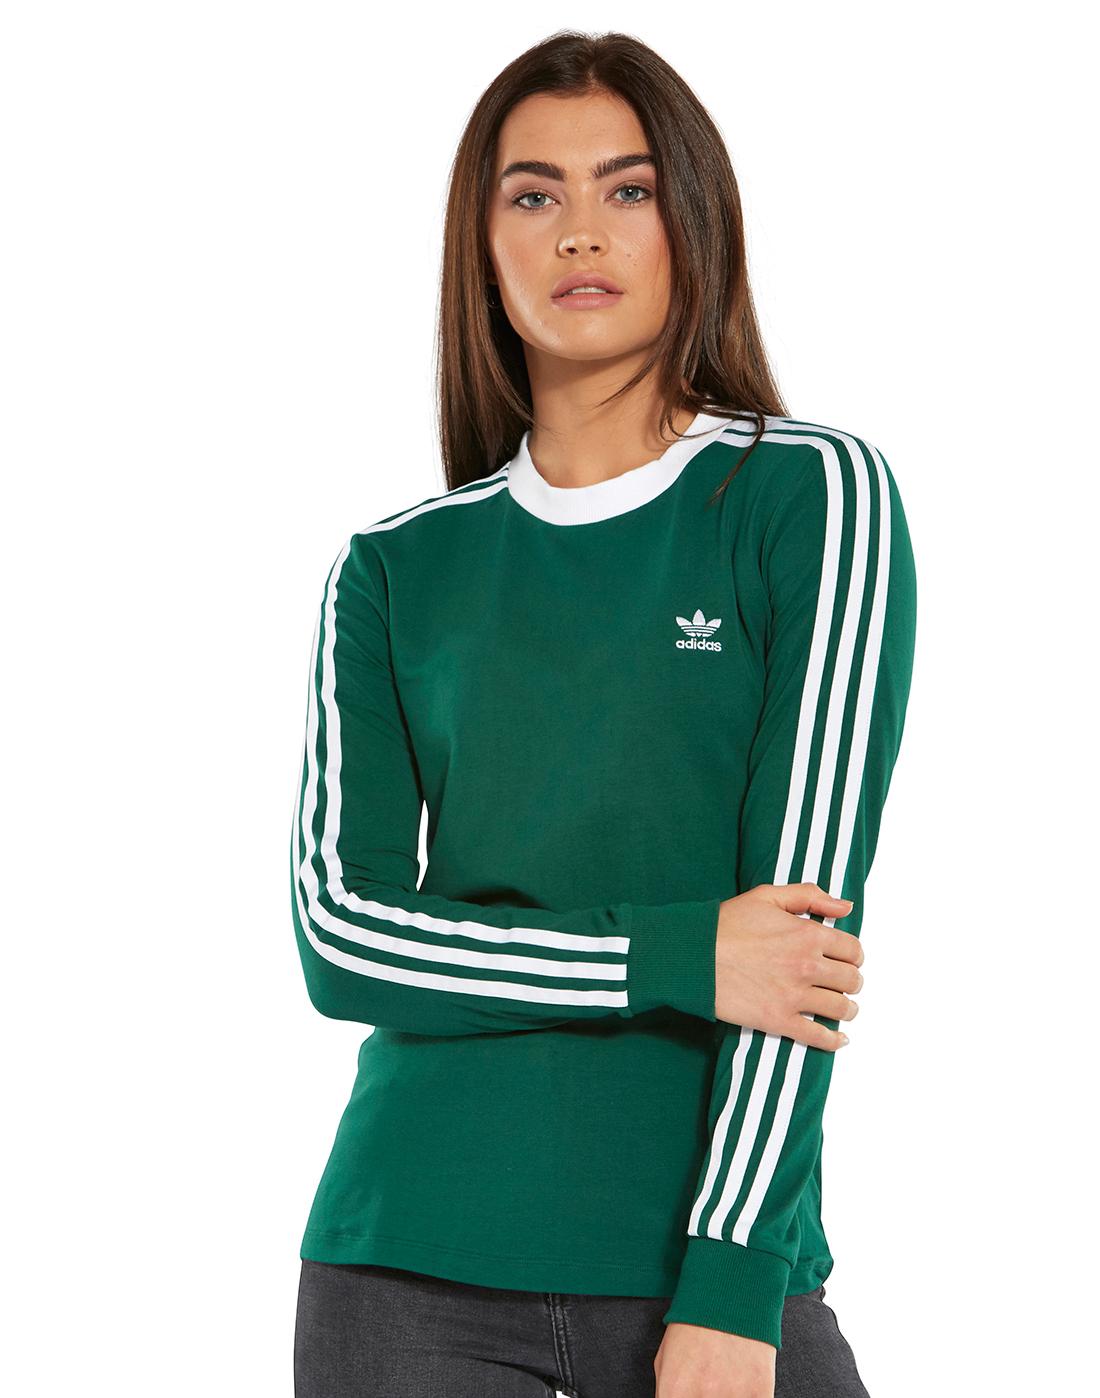 Green adidas Originals Long Sleeve Top